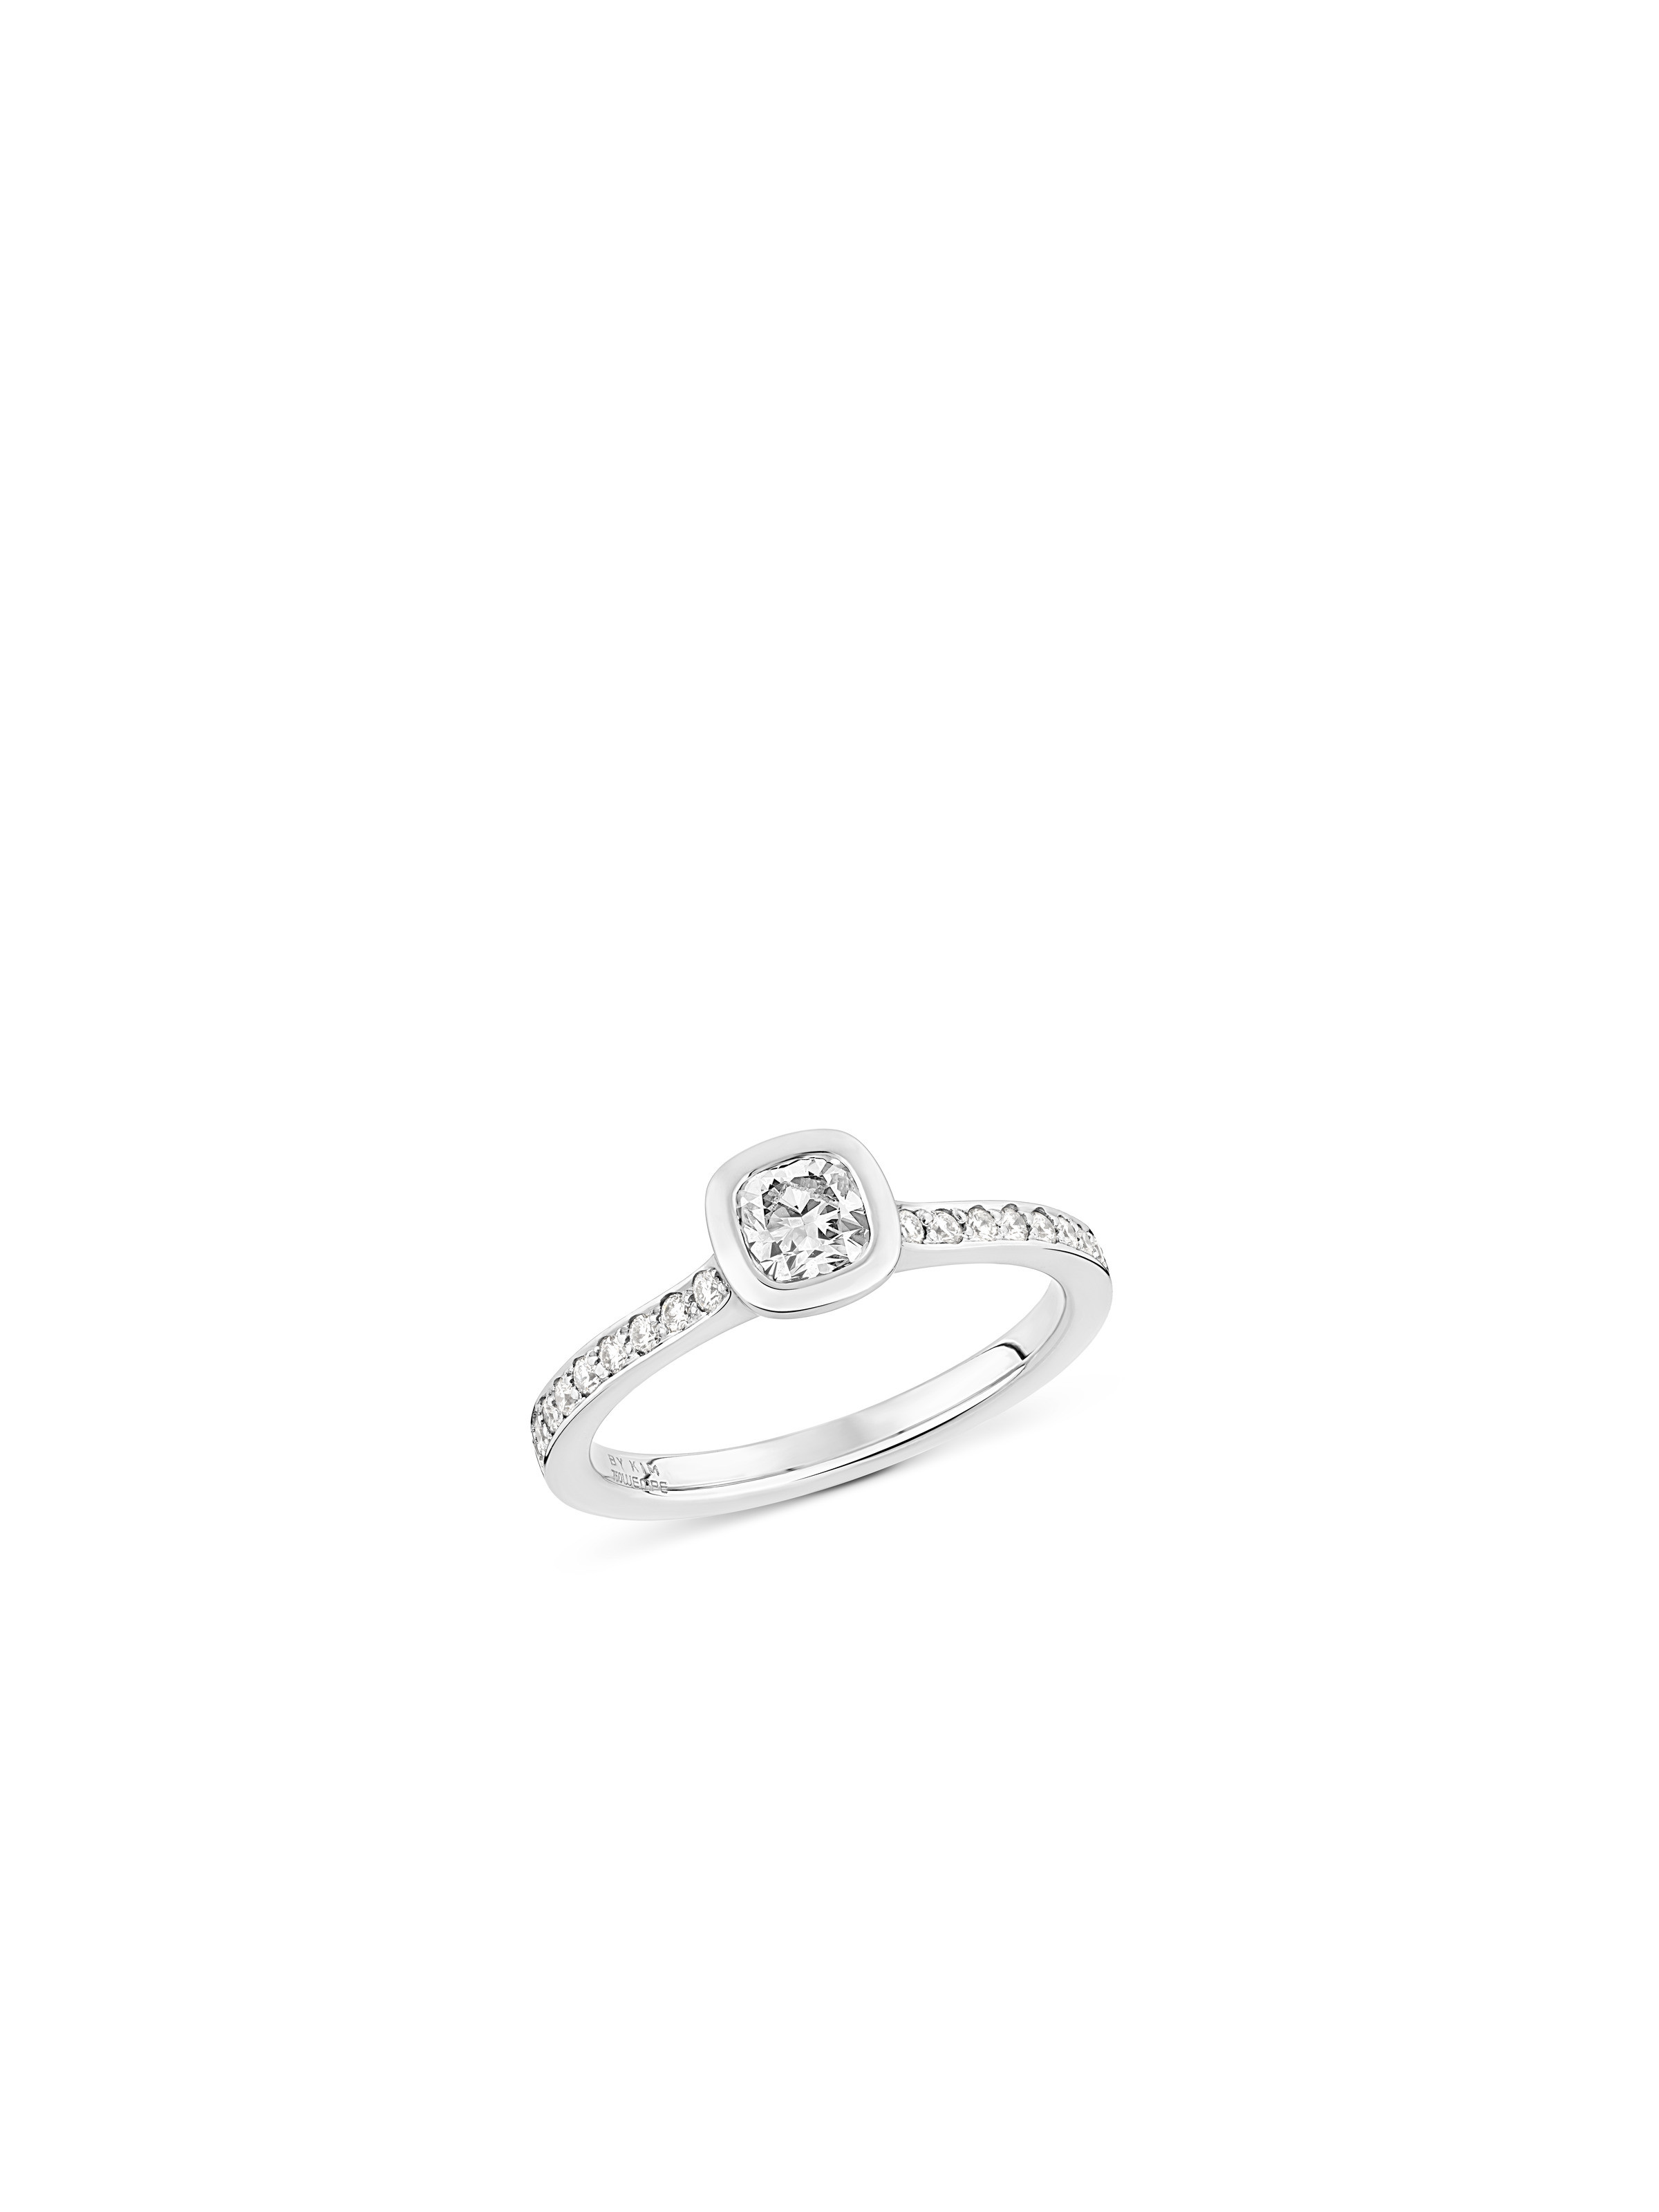 Promise Amphore ring